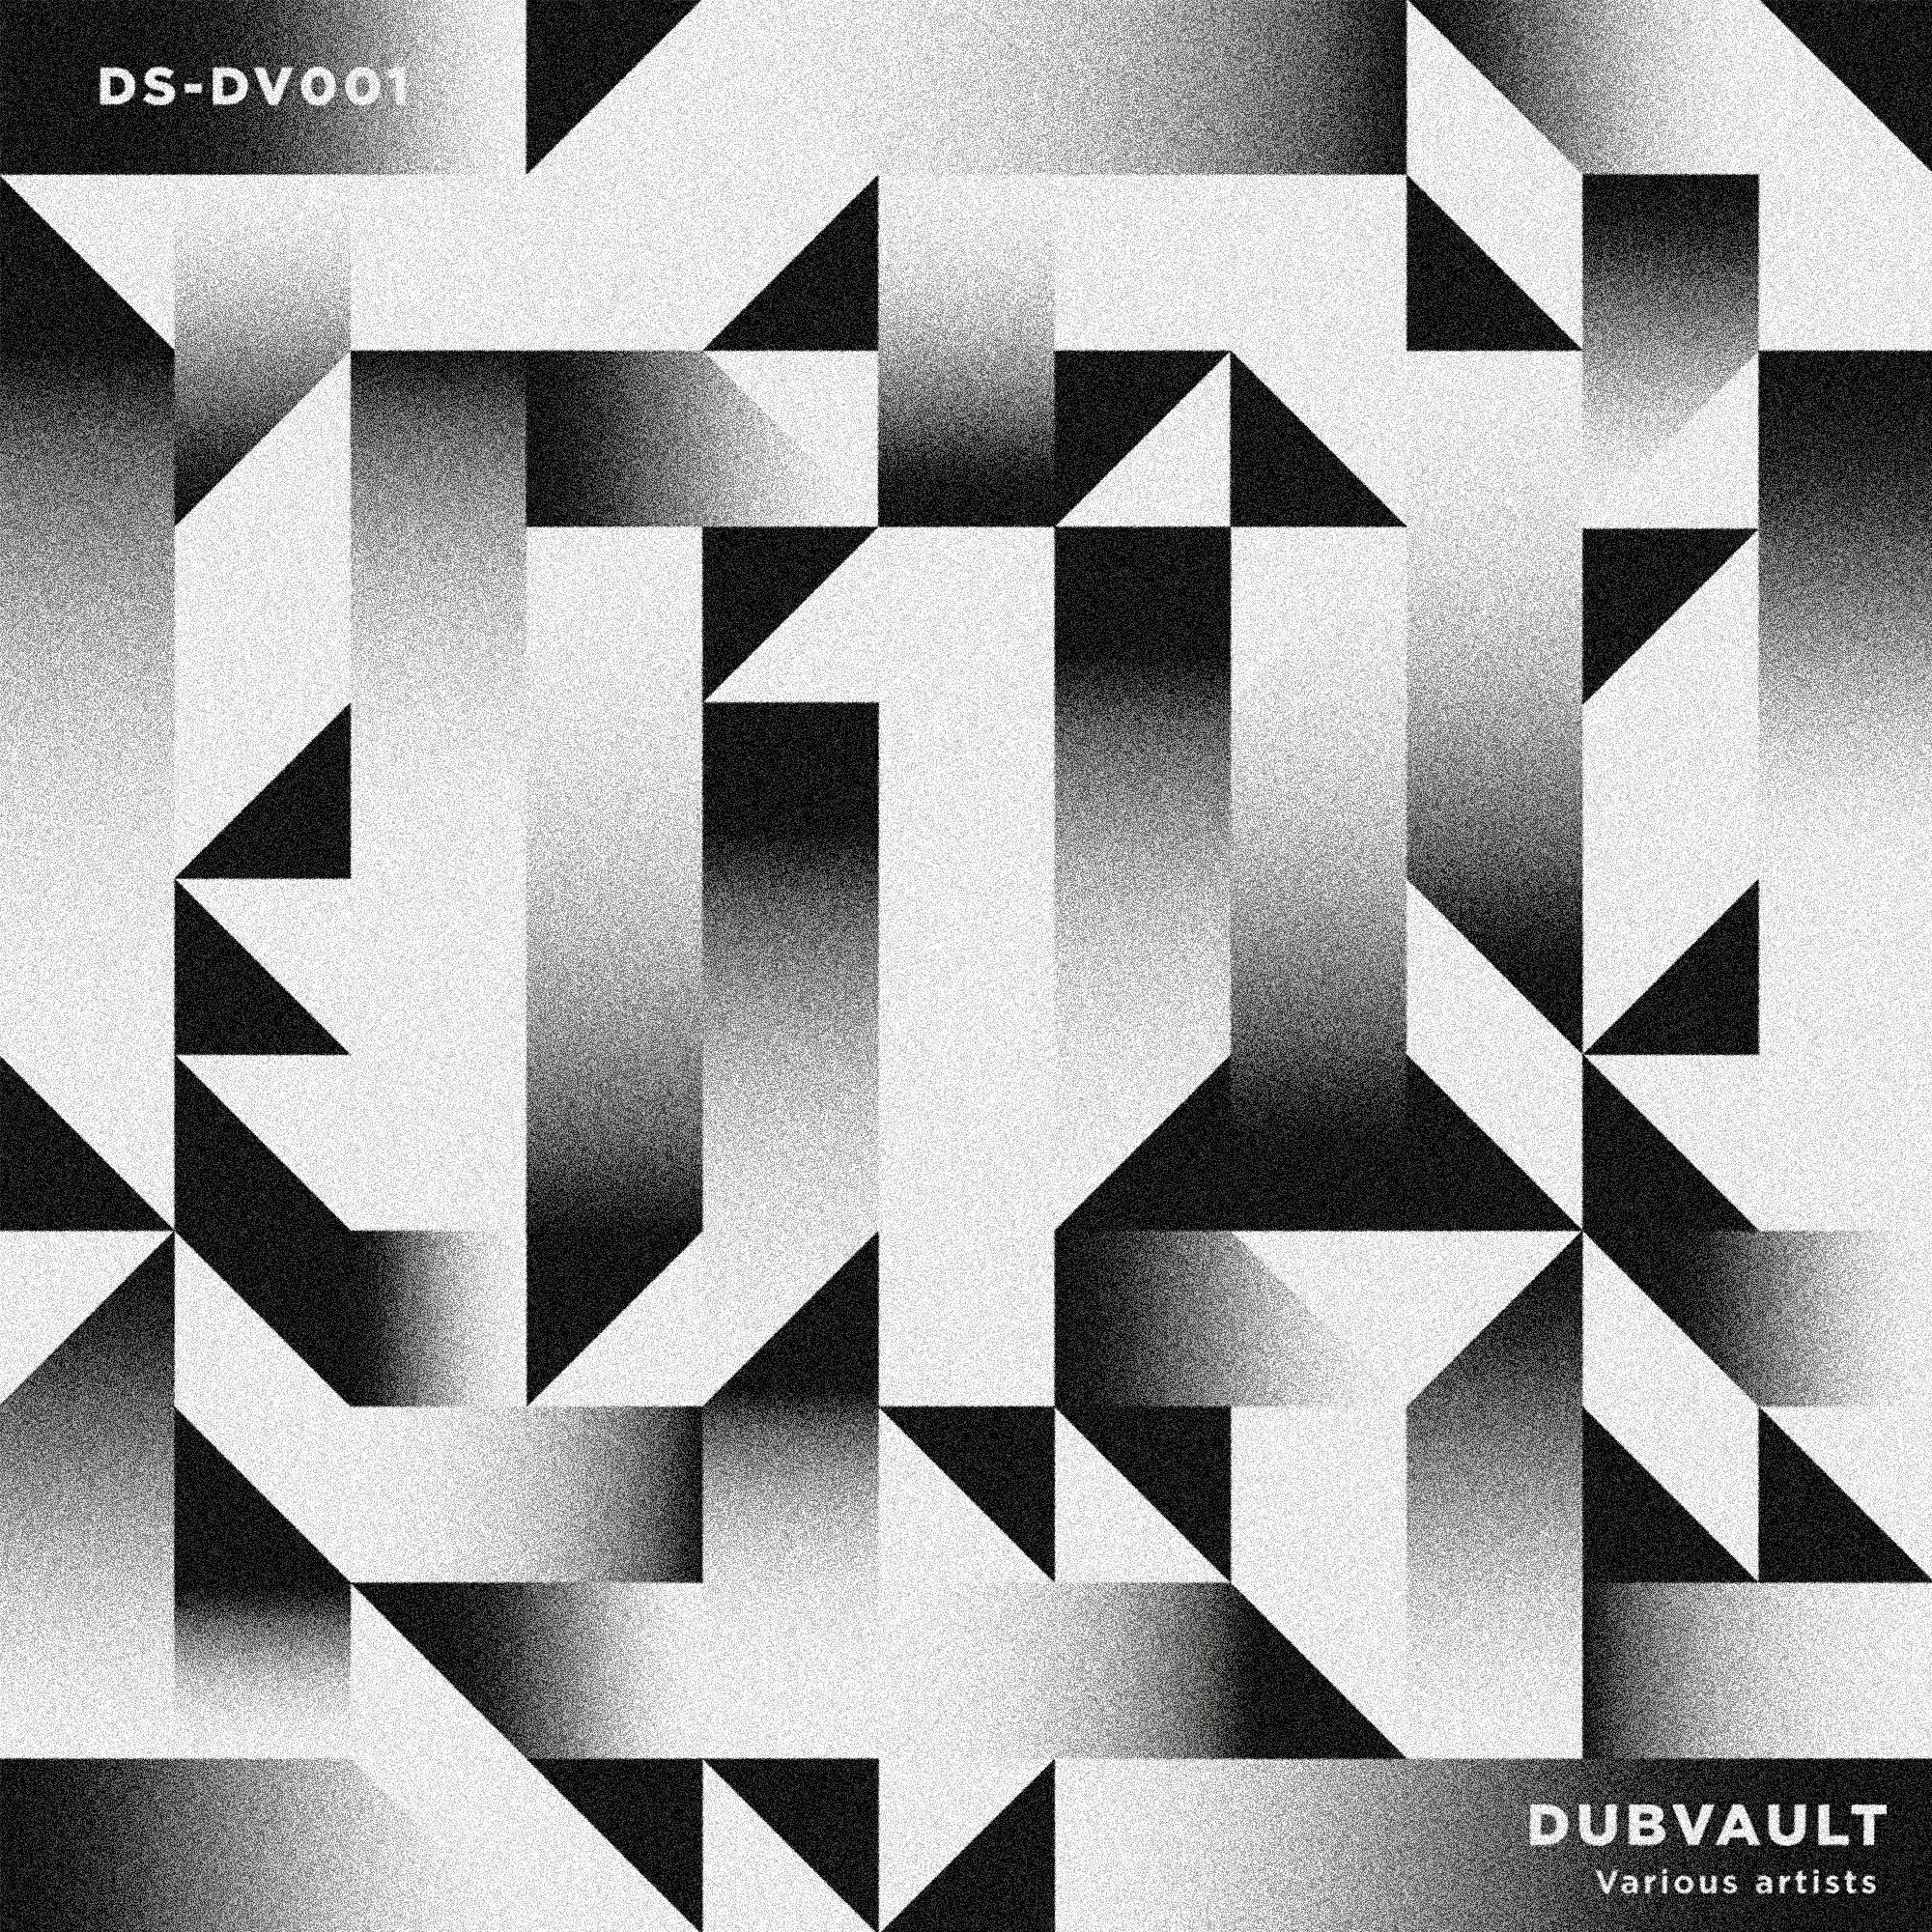 Dubvault Volume 1